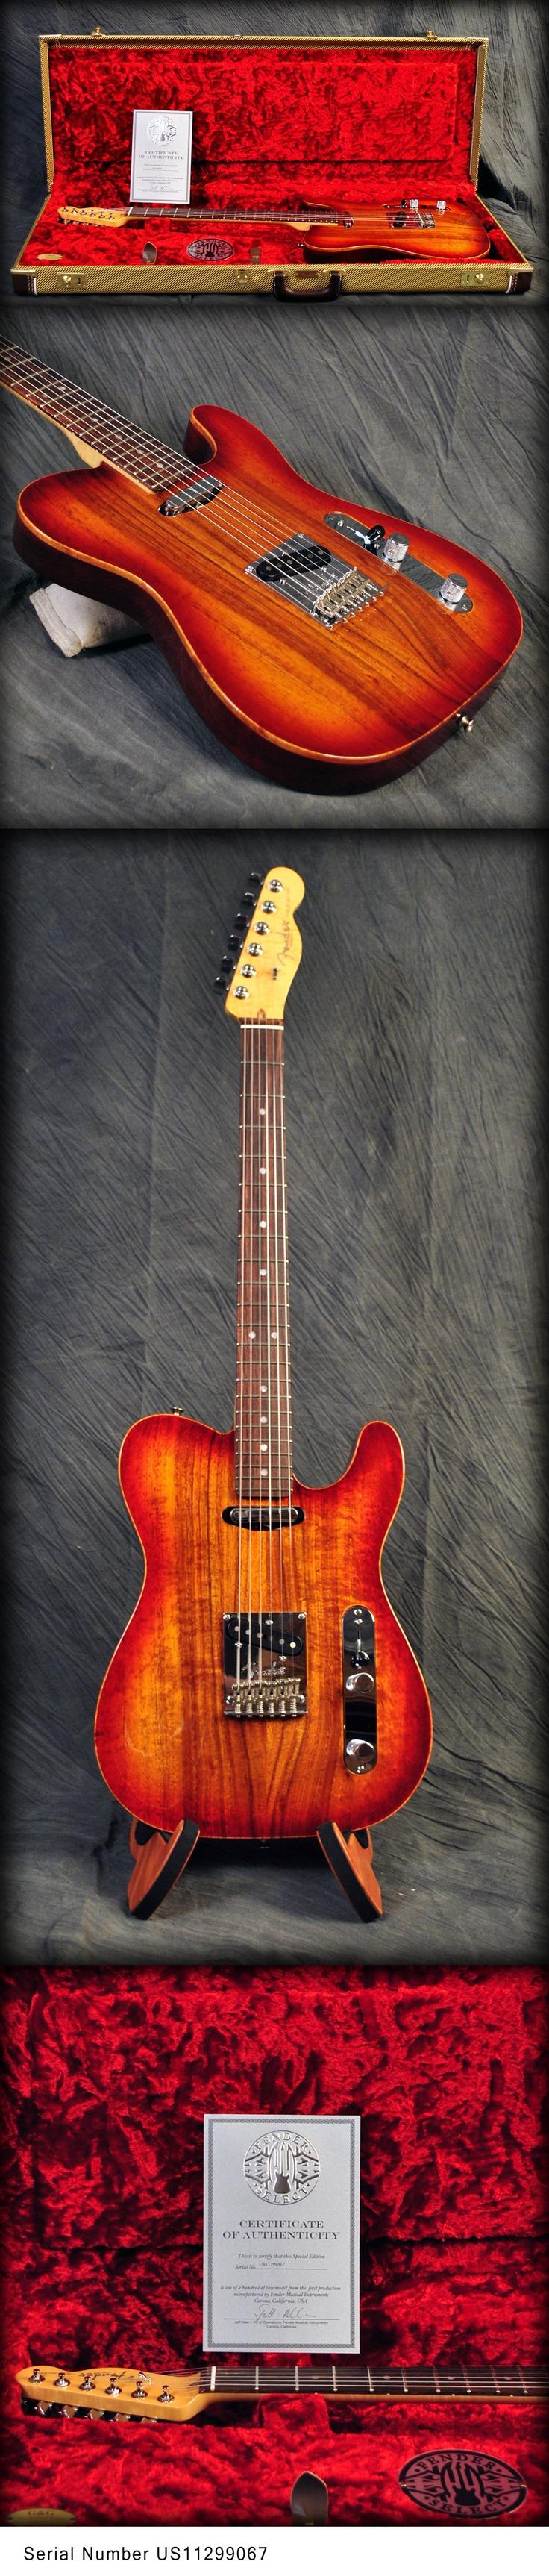 Fender Select Telecaster Craved Top Koa